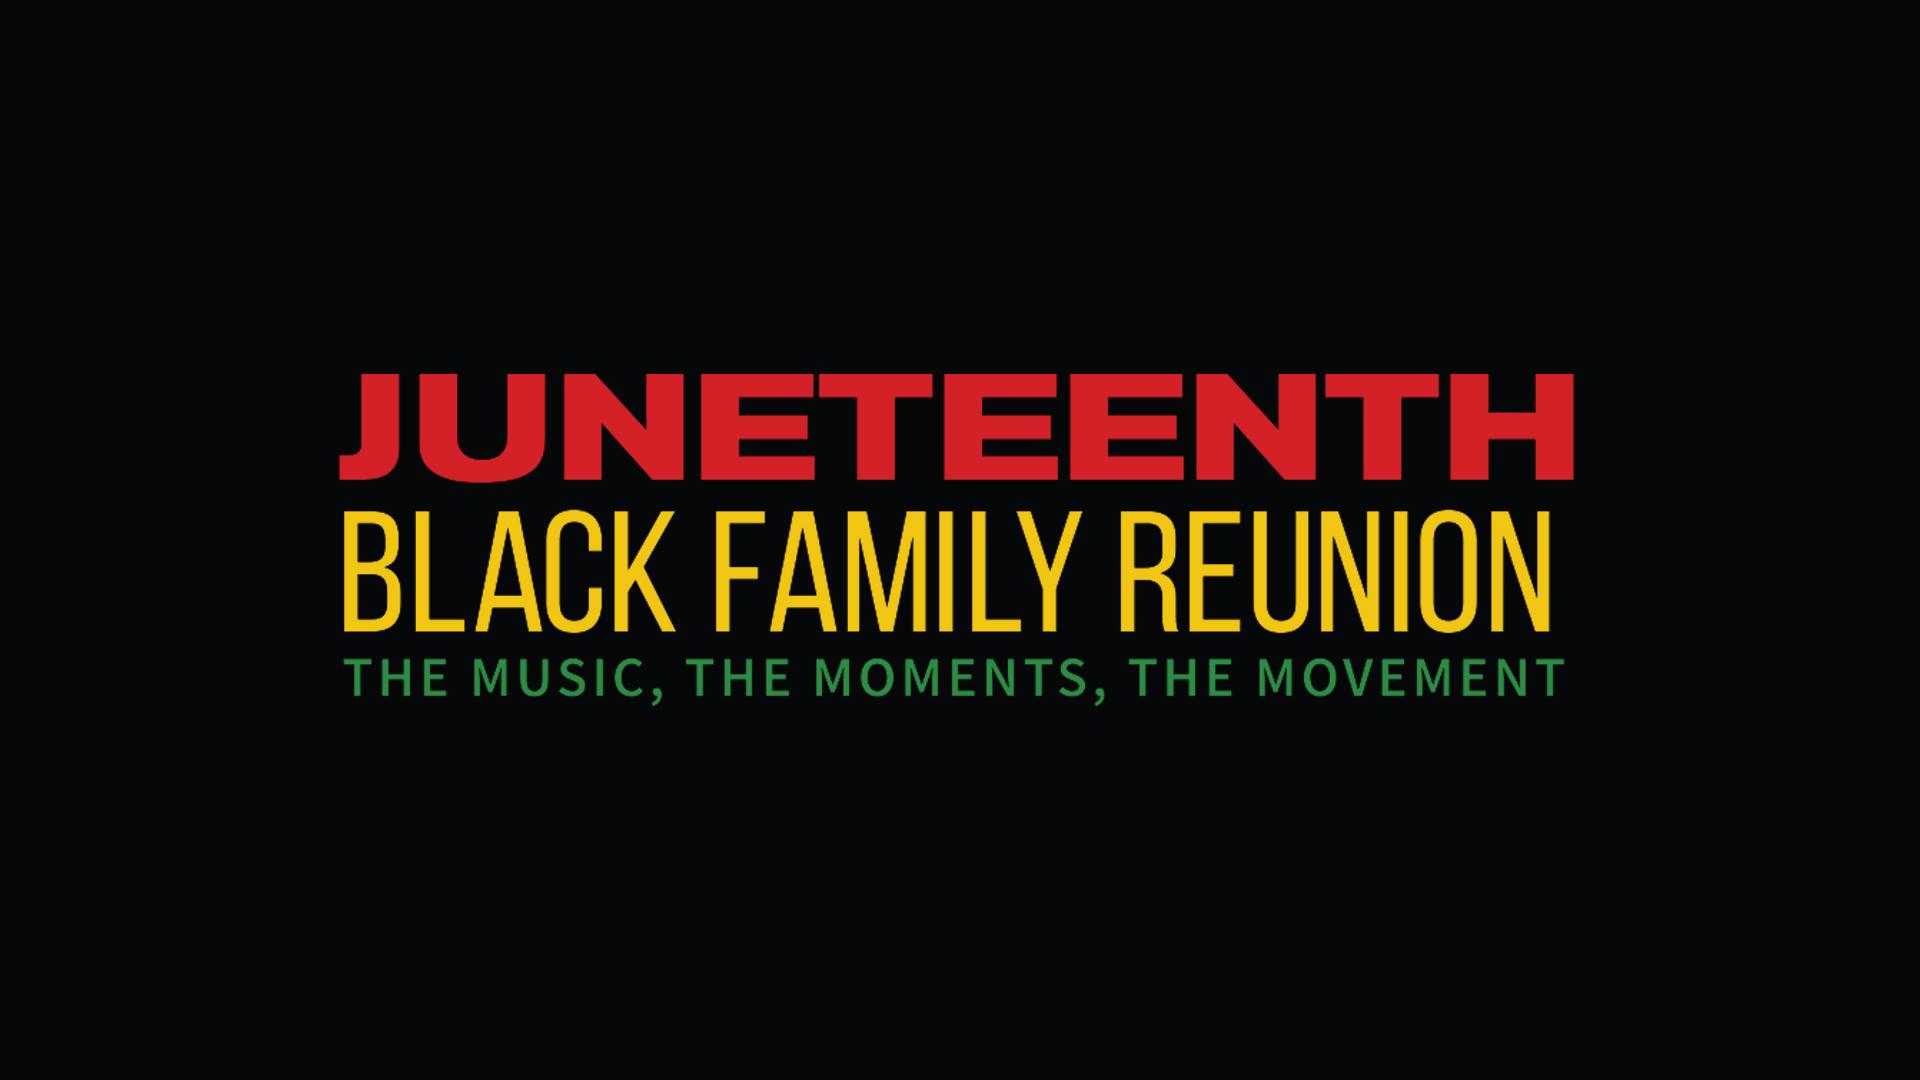 JuneteenthBlack Family Reunion